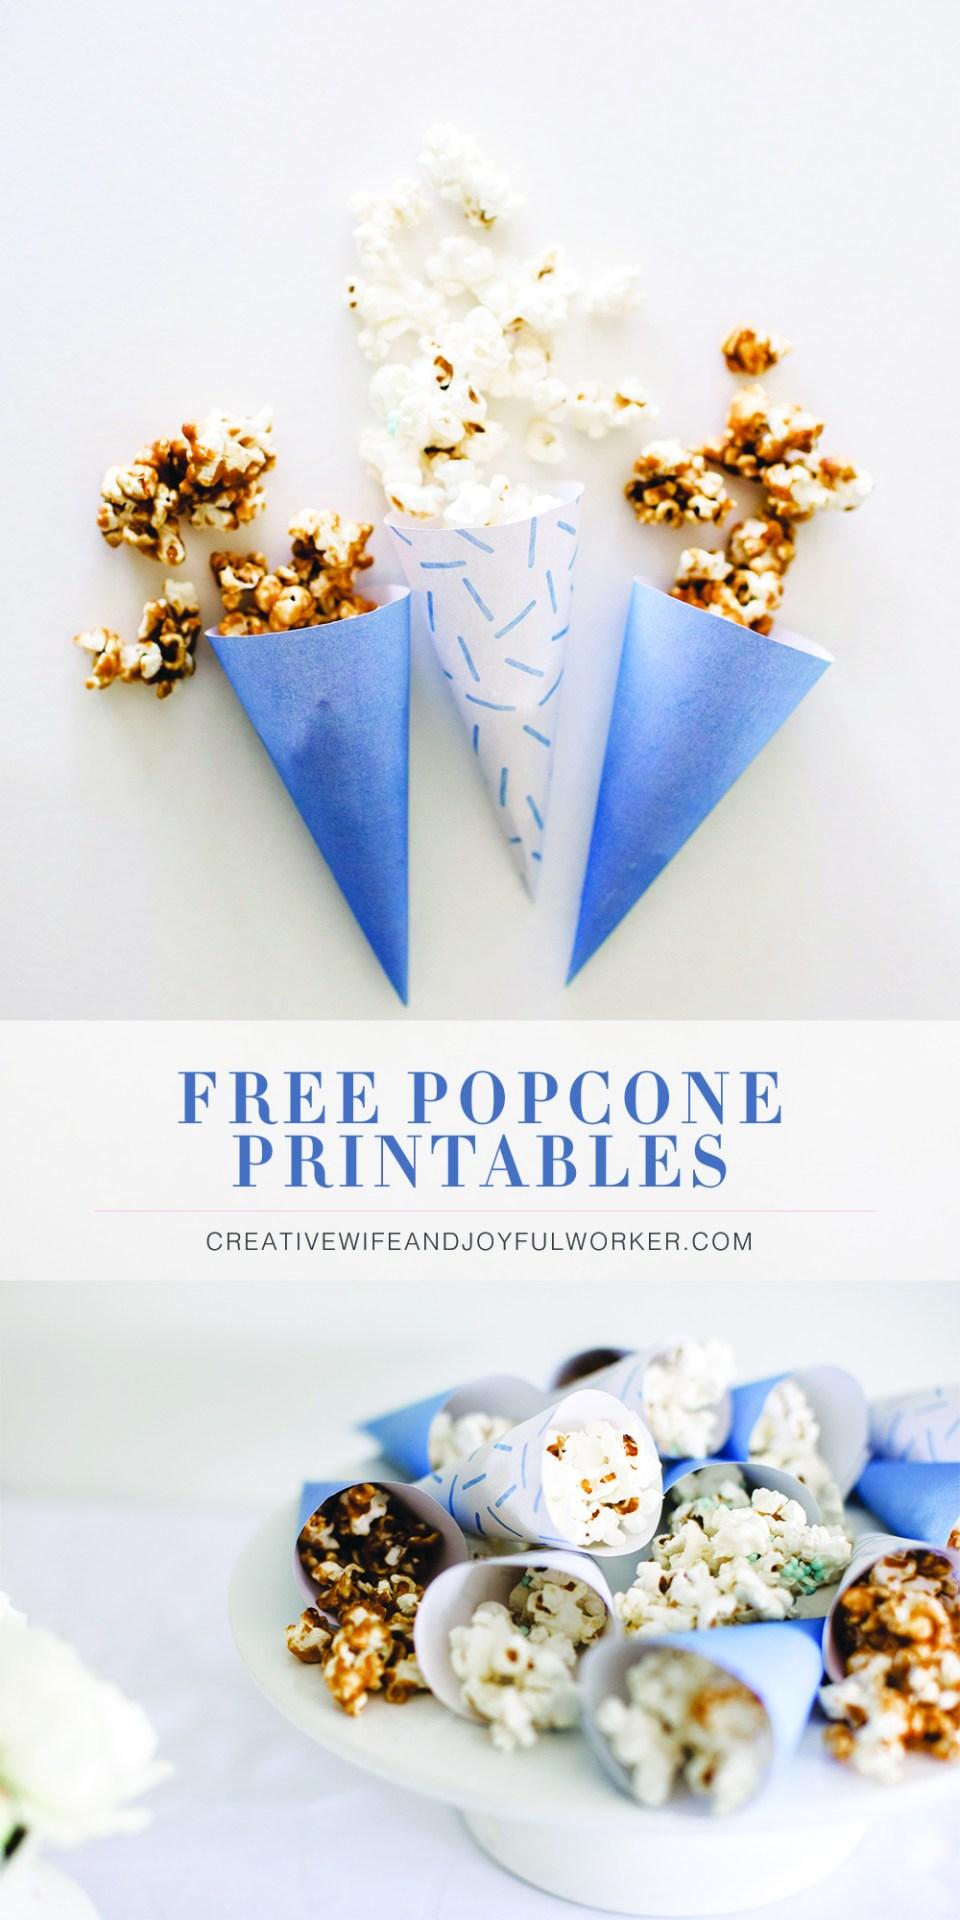 Free Popcone Printables